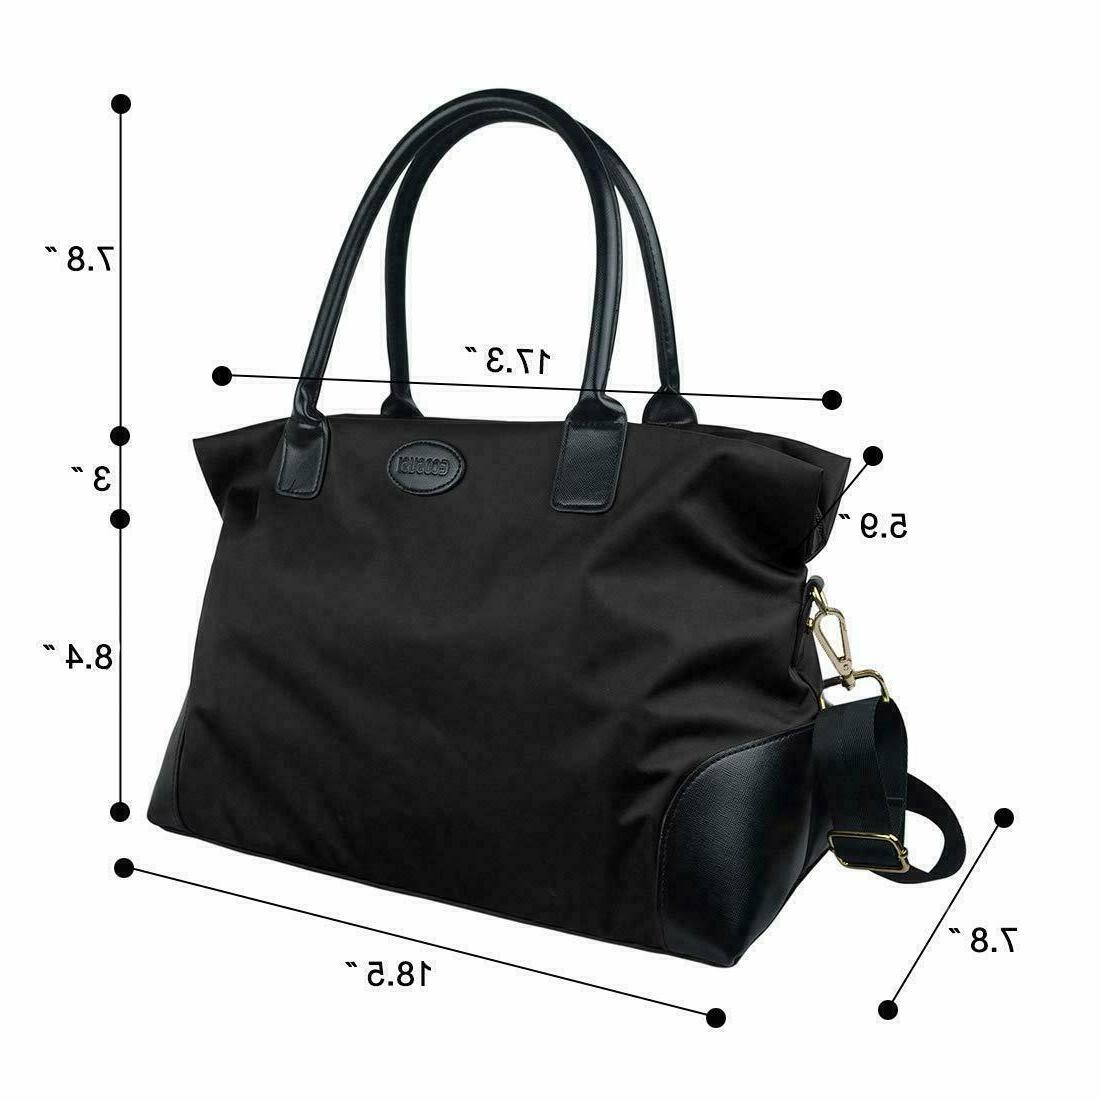 ECOSUSI Unisex Large Weekender Bag Duffel Gym Totes Handle